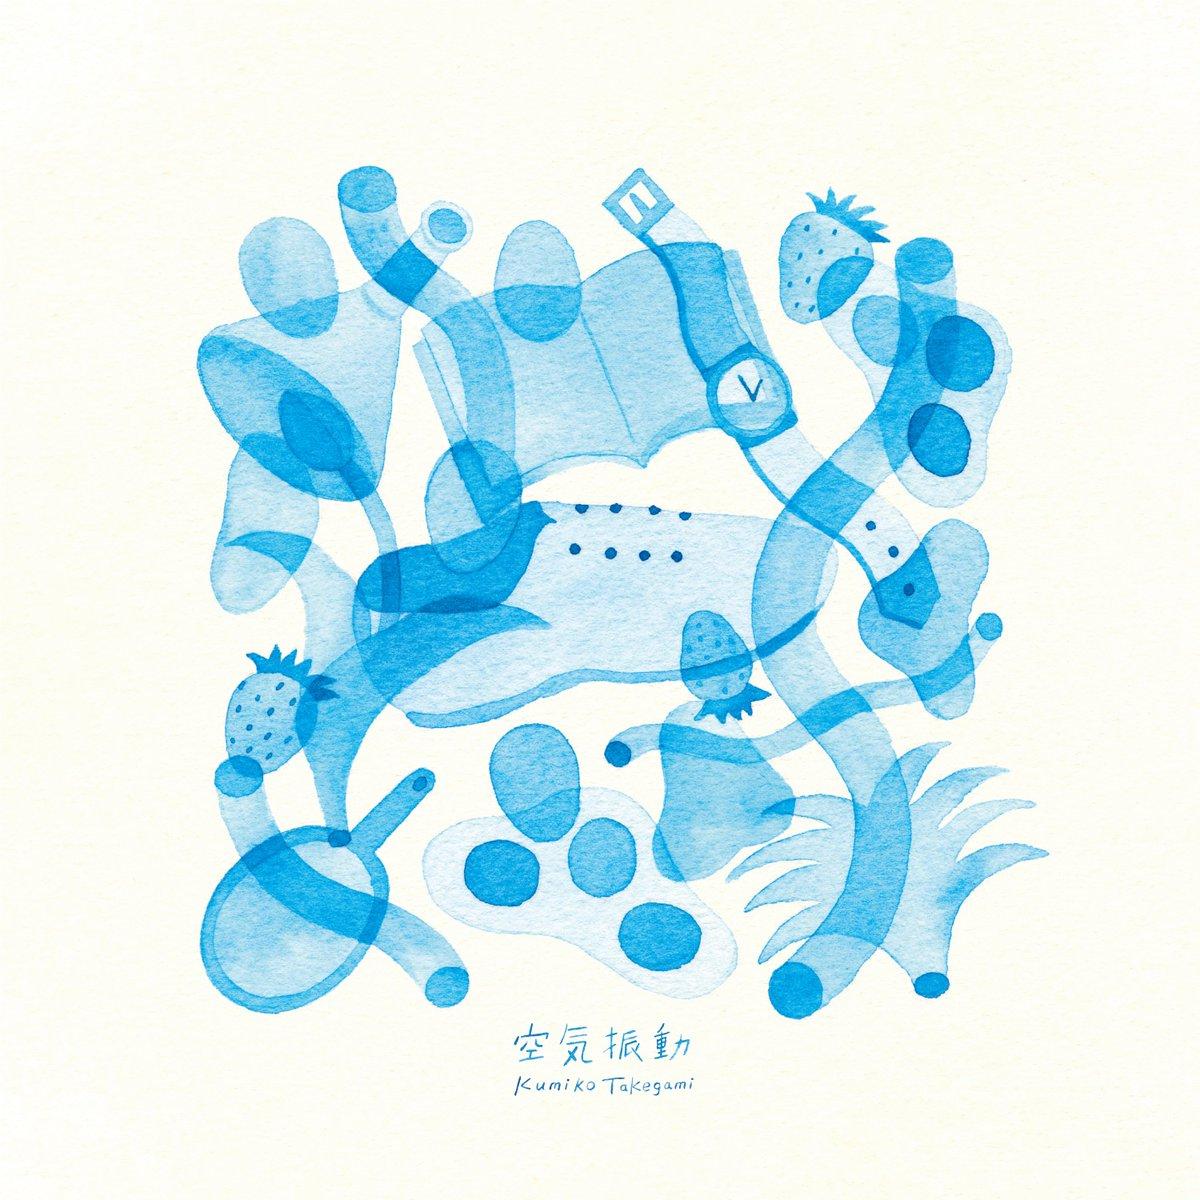 ✨Full Album「空気振動」ストリーミング&配信中✨■iTunes/Apple Music■Spotify JP■Amazon Prime Music:■Amazon.mp3:■LINE MUSIC:などなど!